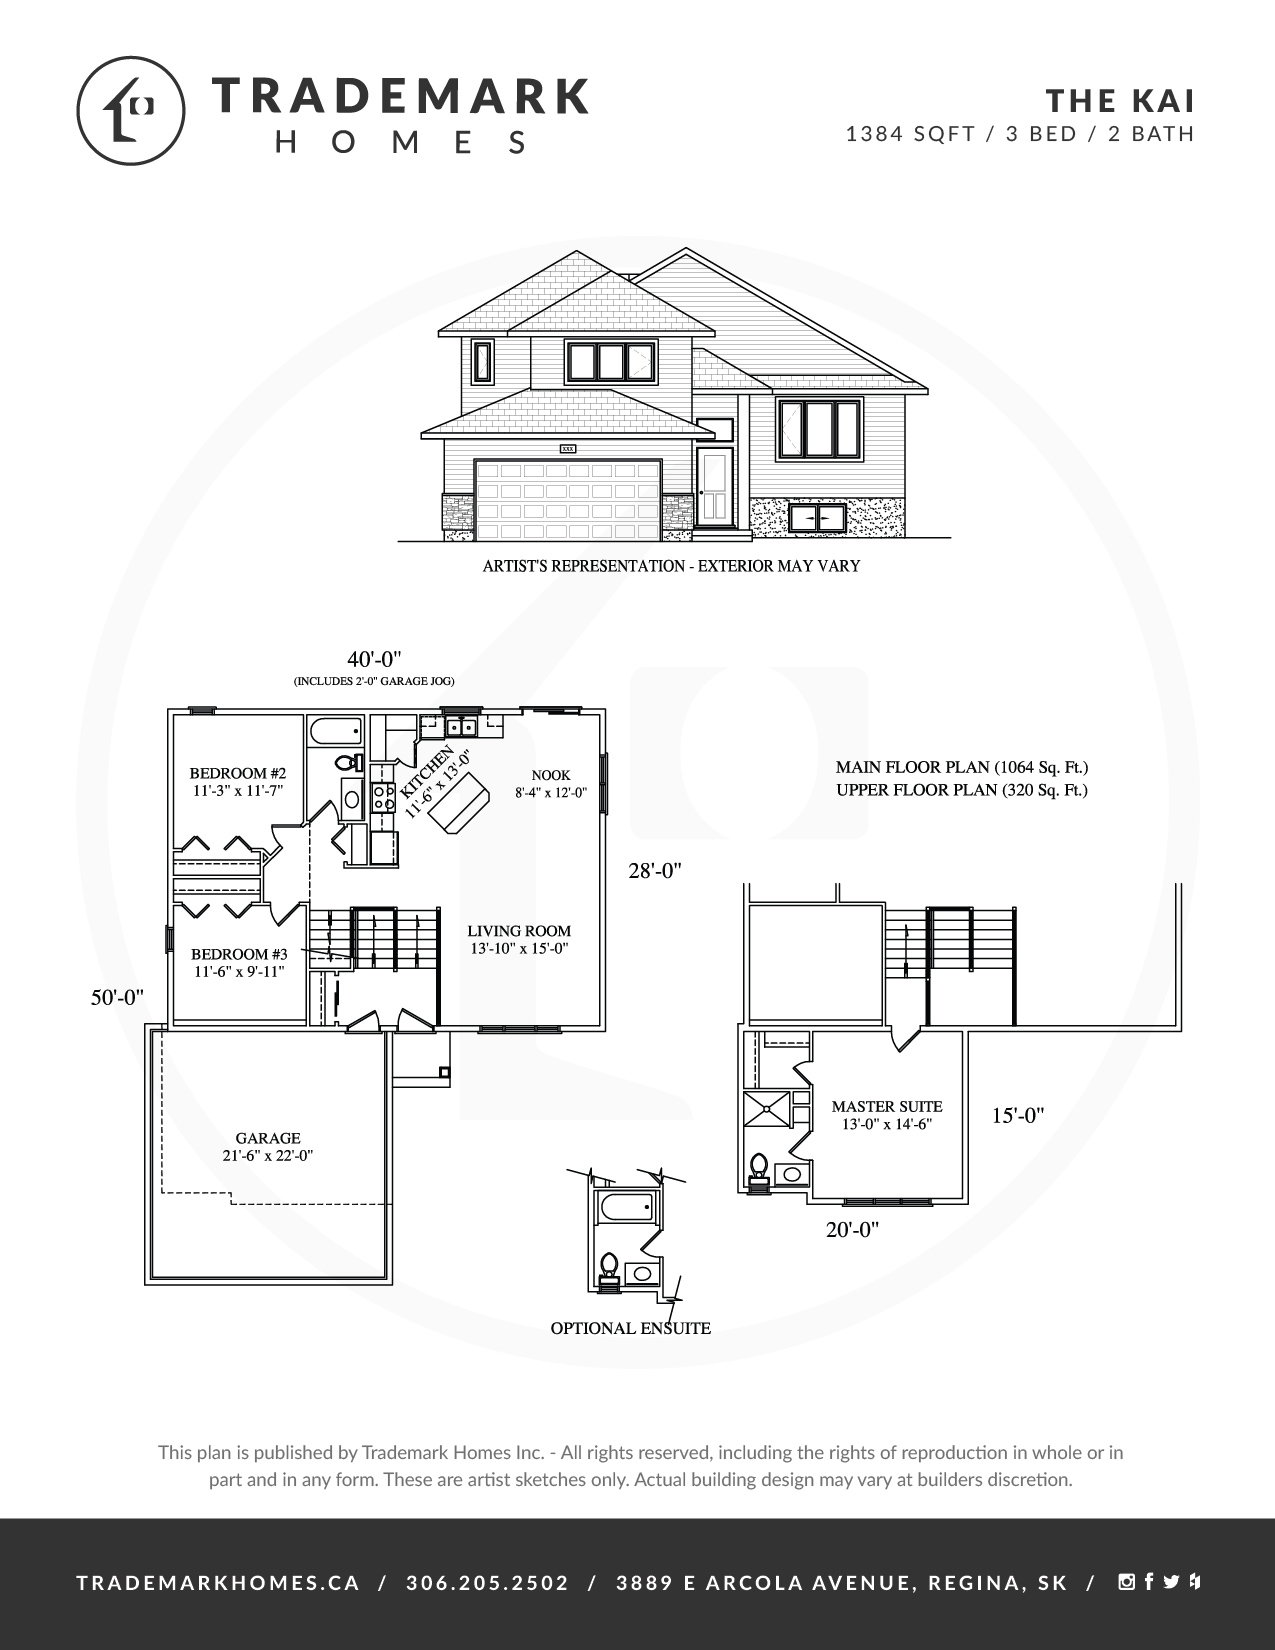 Trademark Homes The Kai Bi-Level